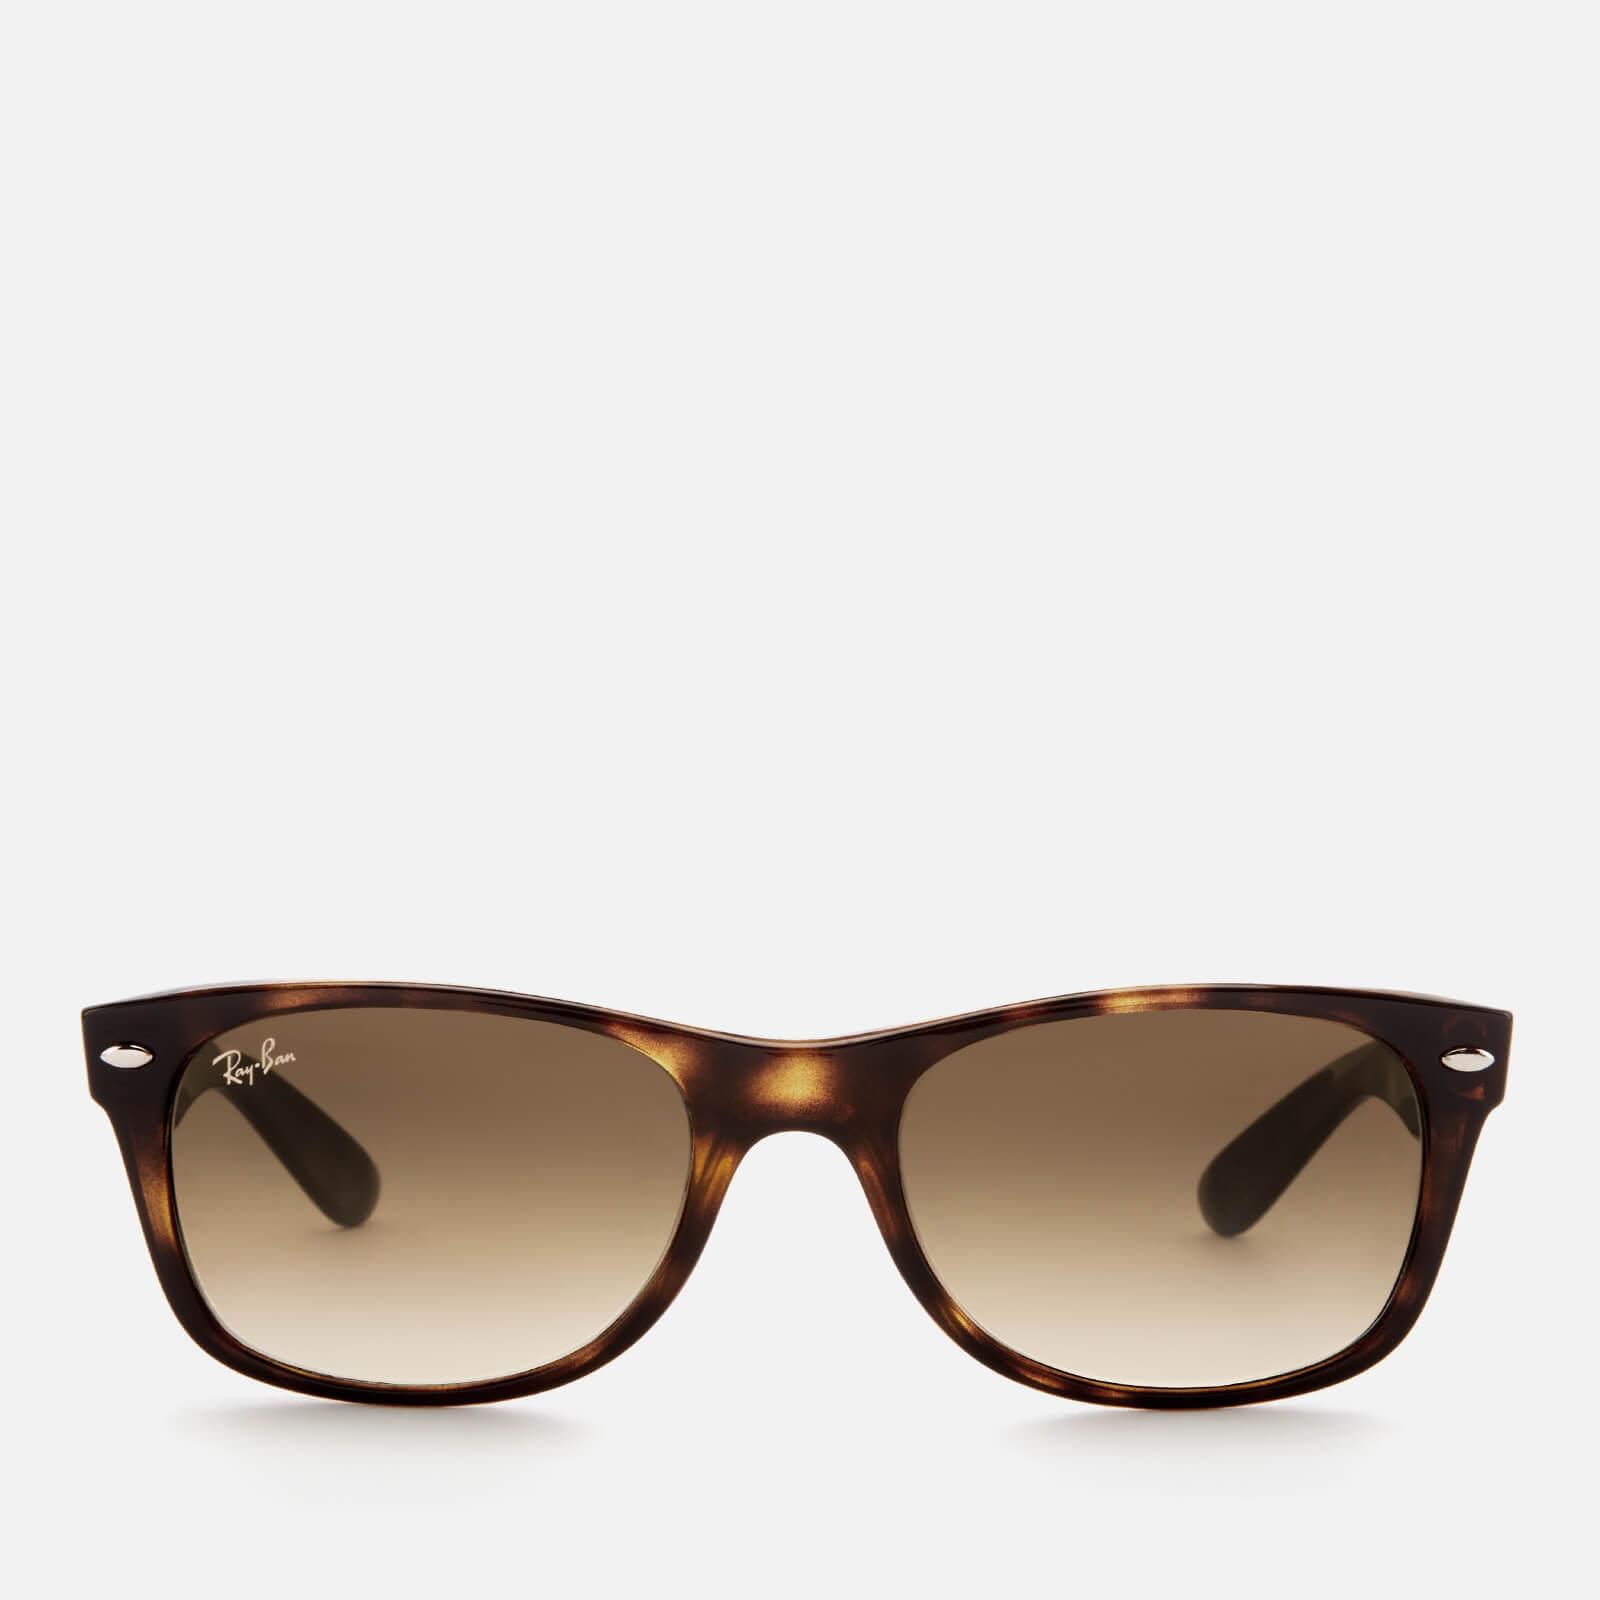 8cb558f0e7 Ray-Ban Men s New Wayfarer Sunglasses - Light Havana Mens ...